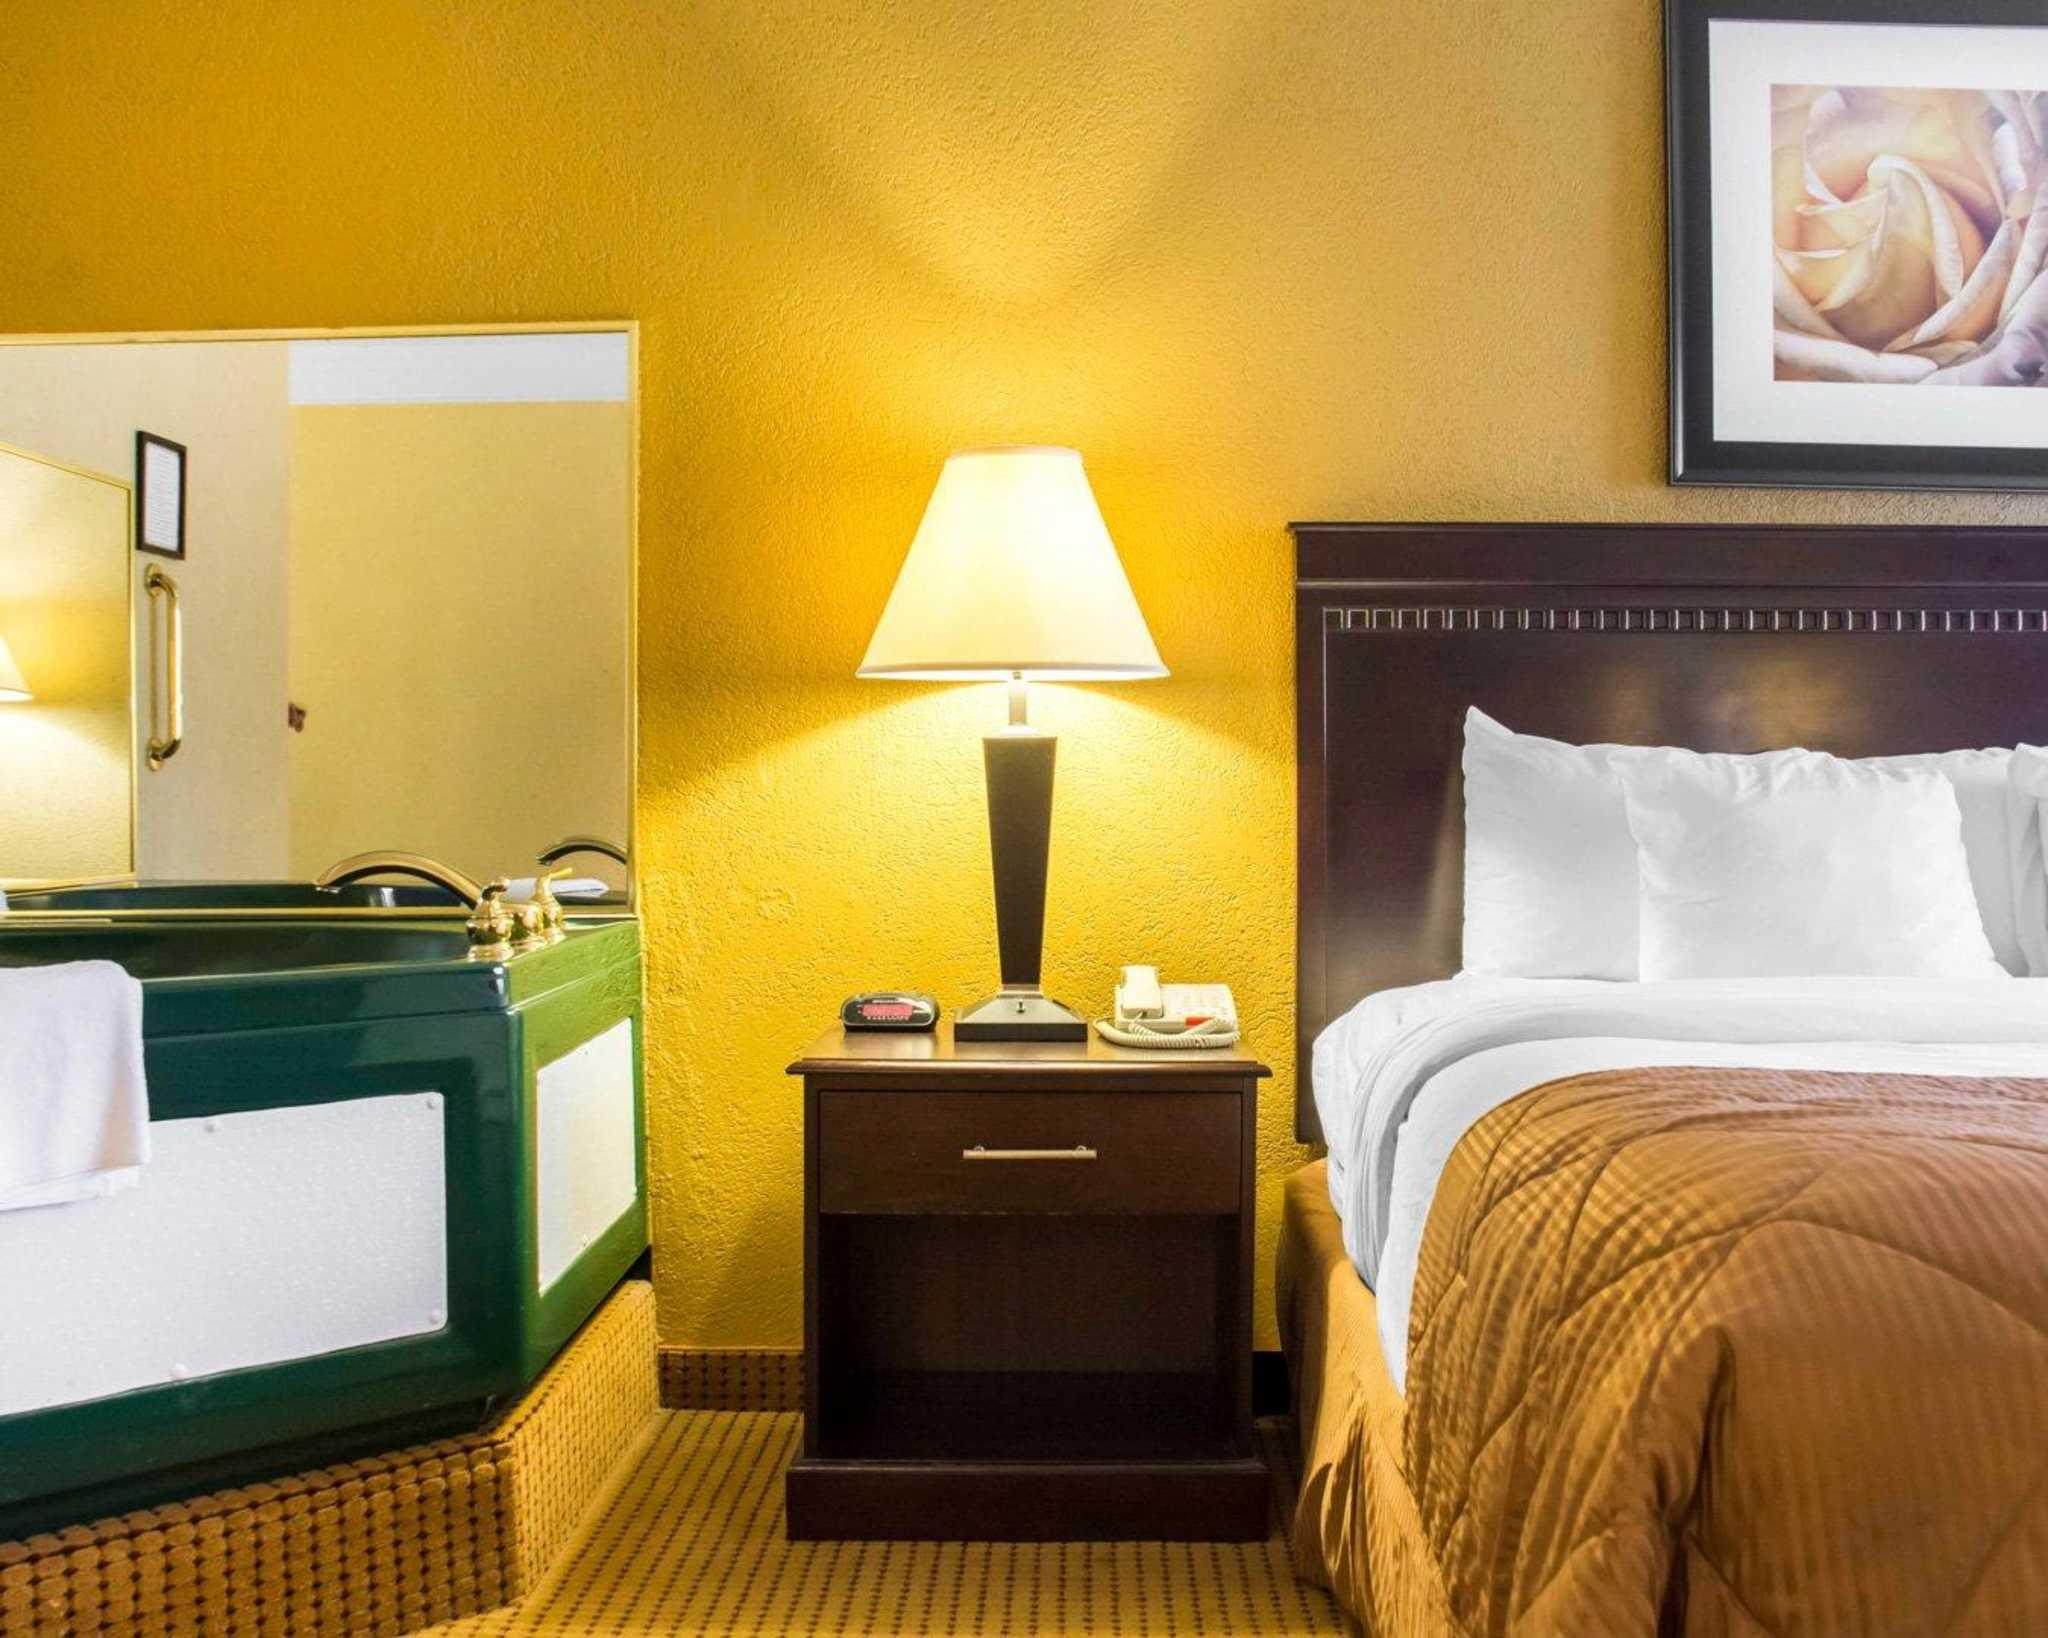 Quality Inn & Suites Fairgrounds image 22